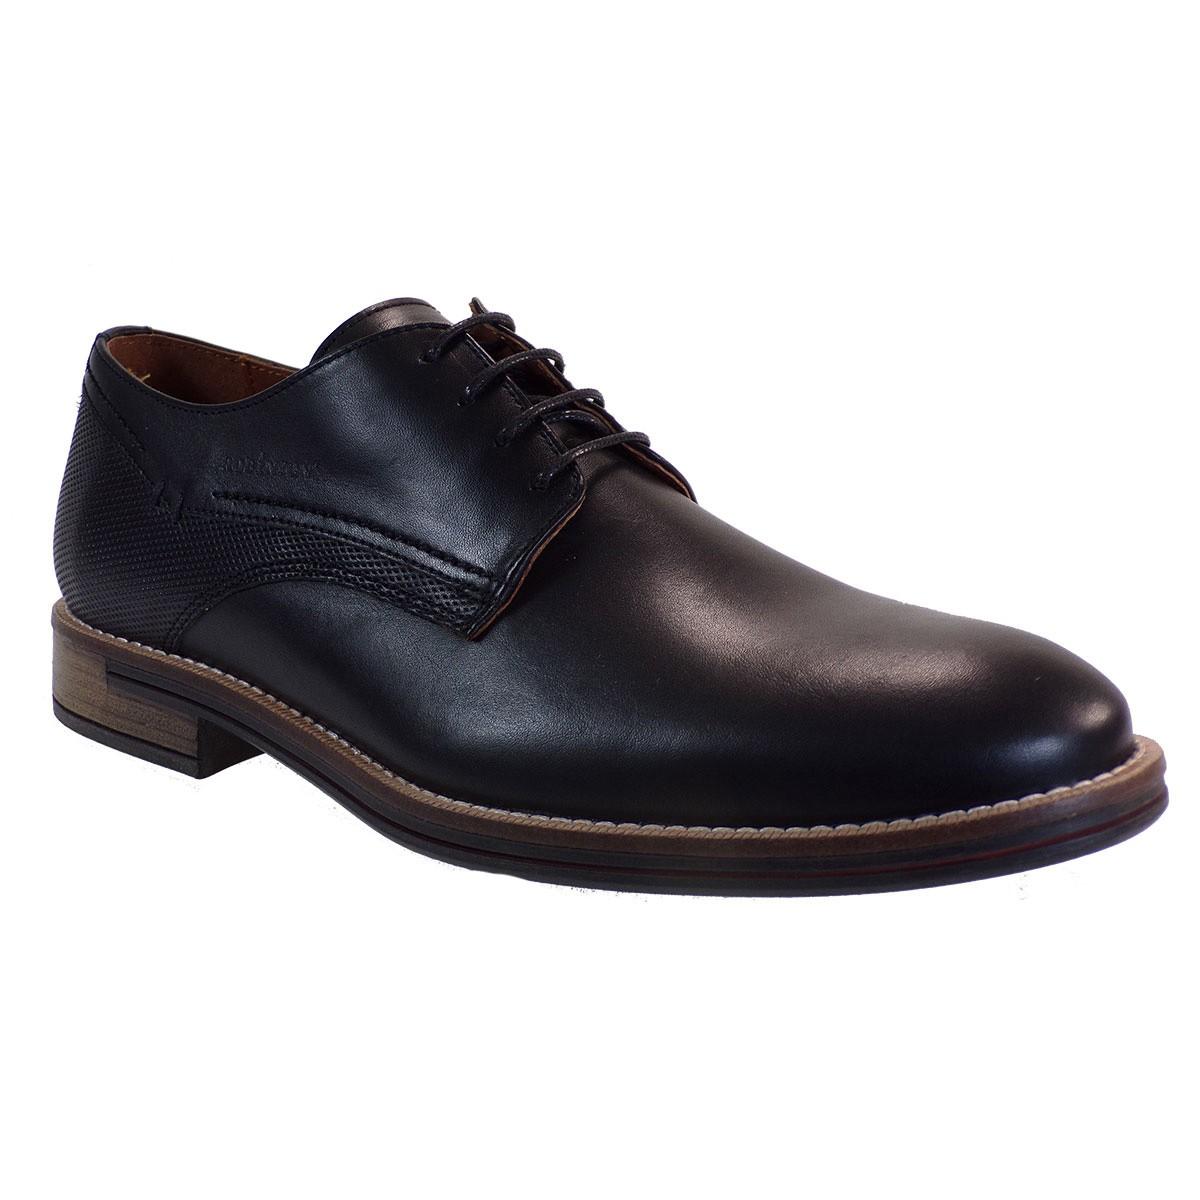 Robinson Ανδρικά Παπούτσια 2042 Μαύρο Δέρμα